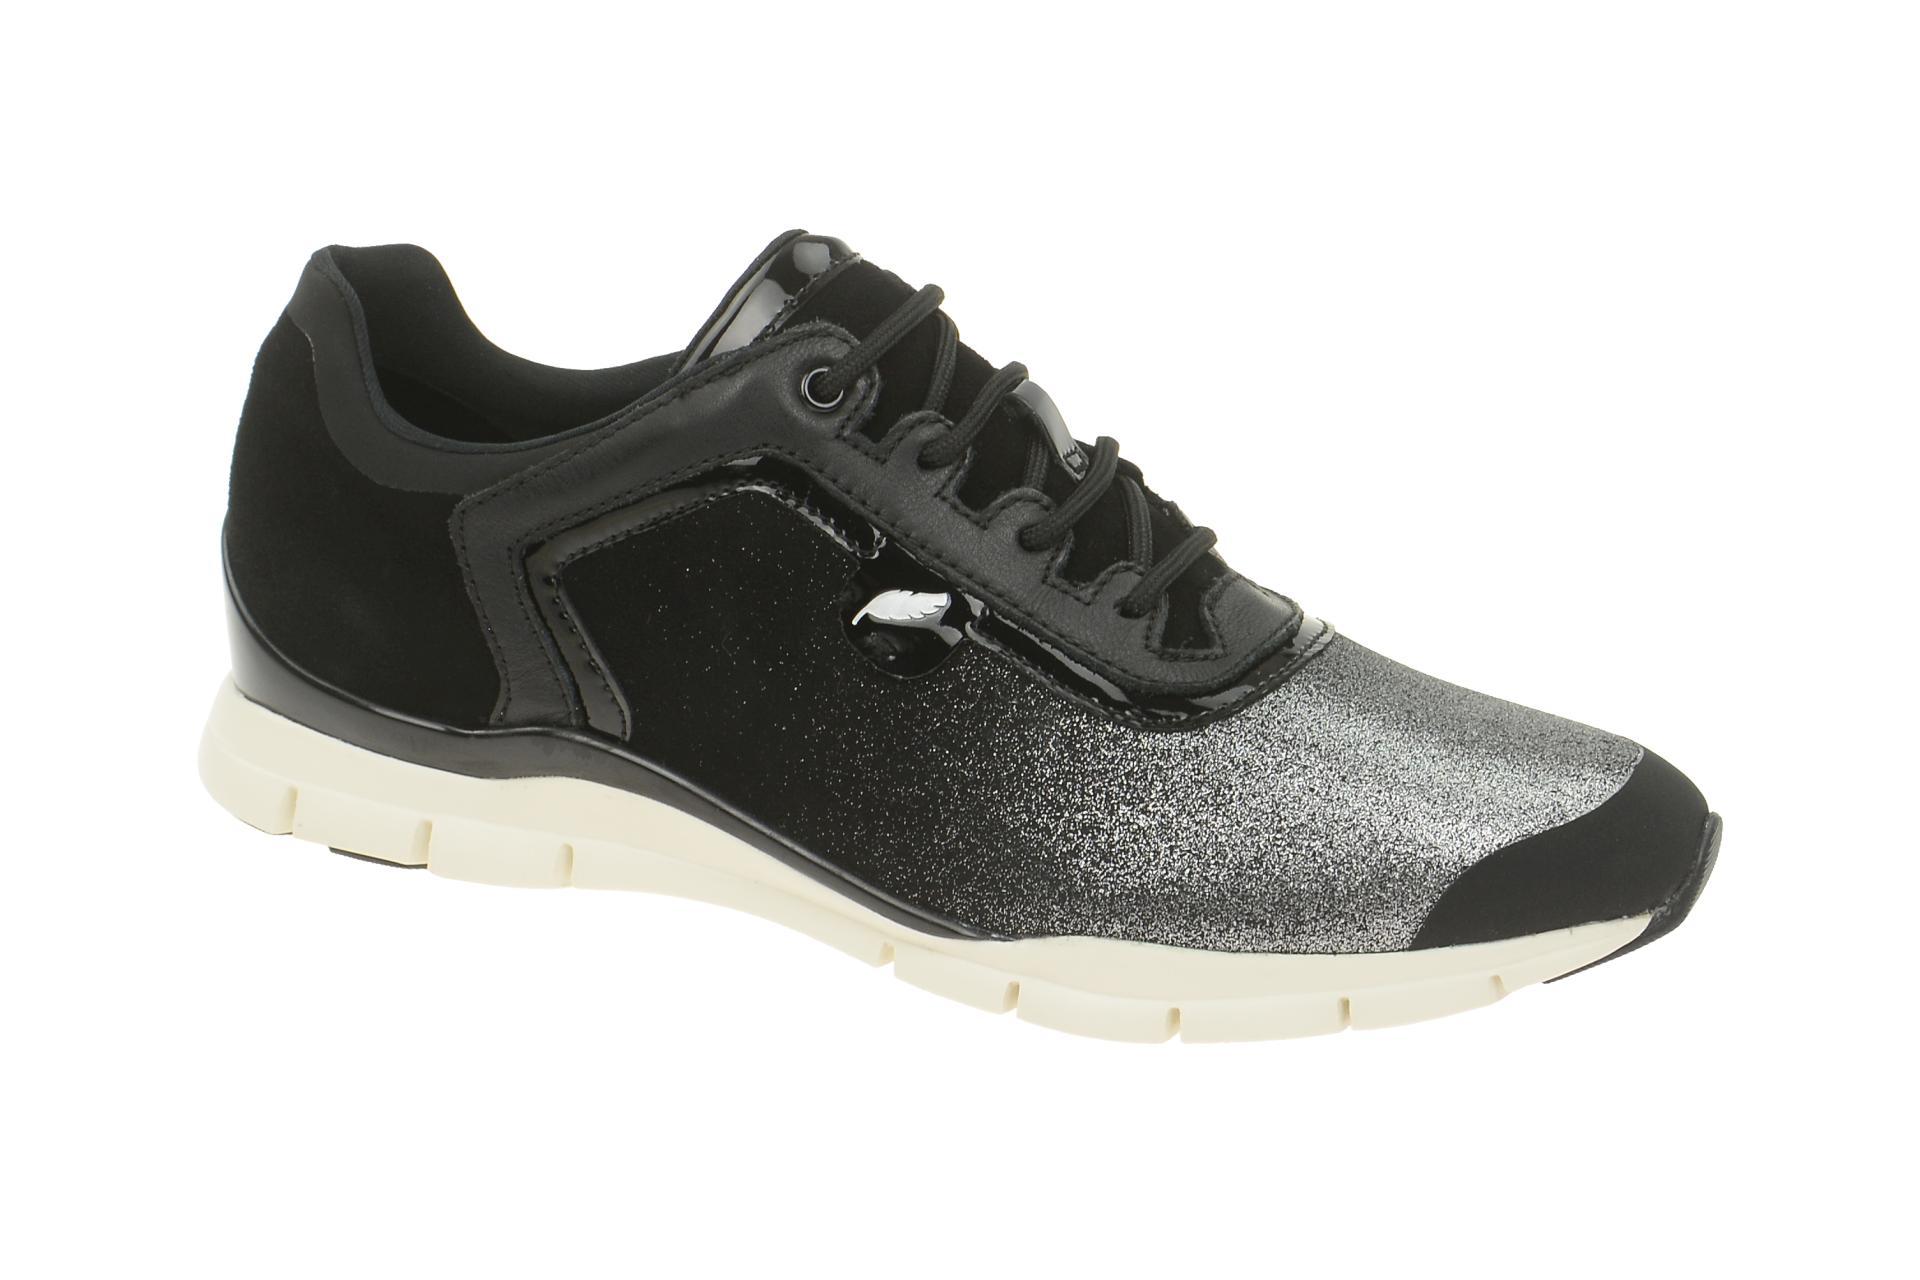 Neu Schuhe Details Schwarz Geox Sukie Sportschuhe C9999 D62f2b Damenschuhe 0j021 Zu dxhrCQts